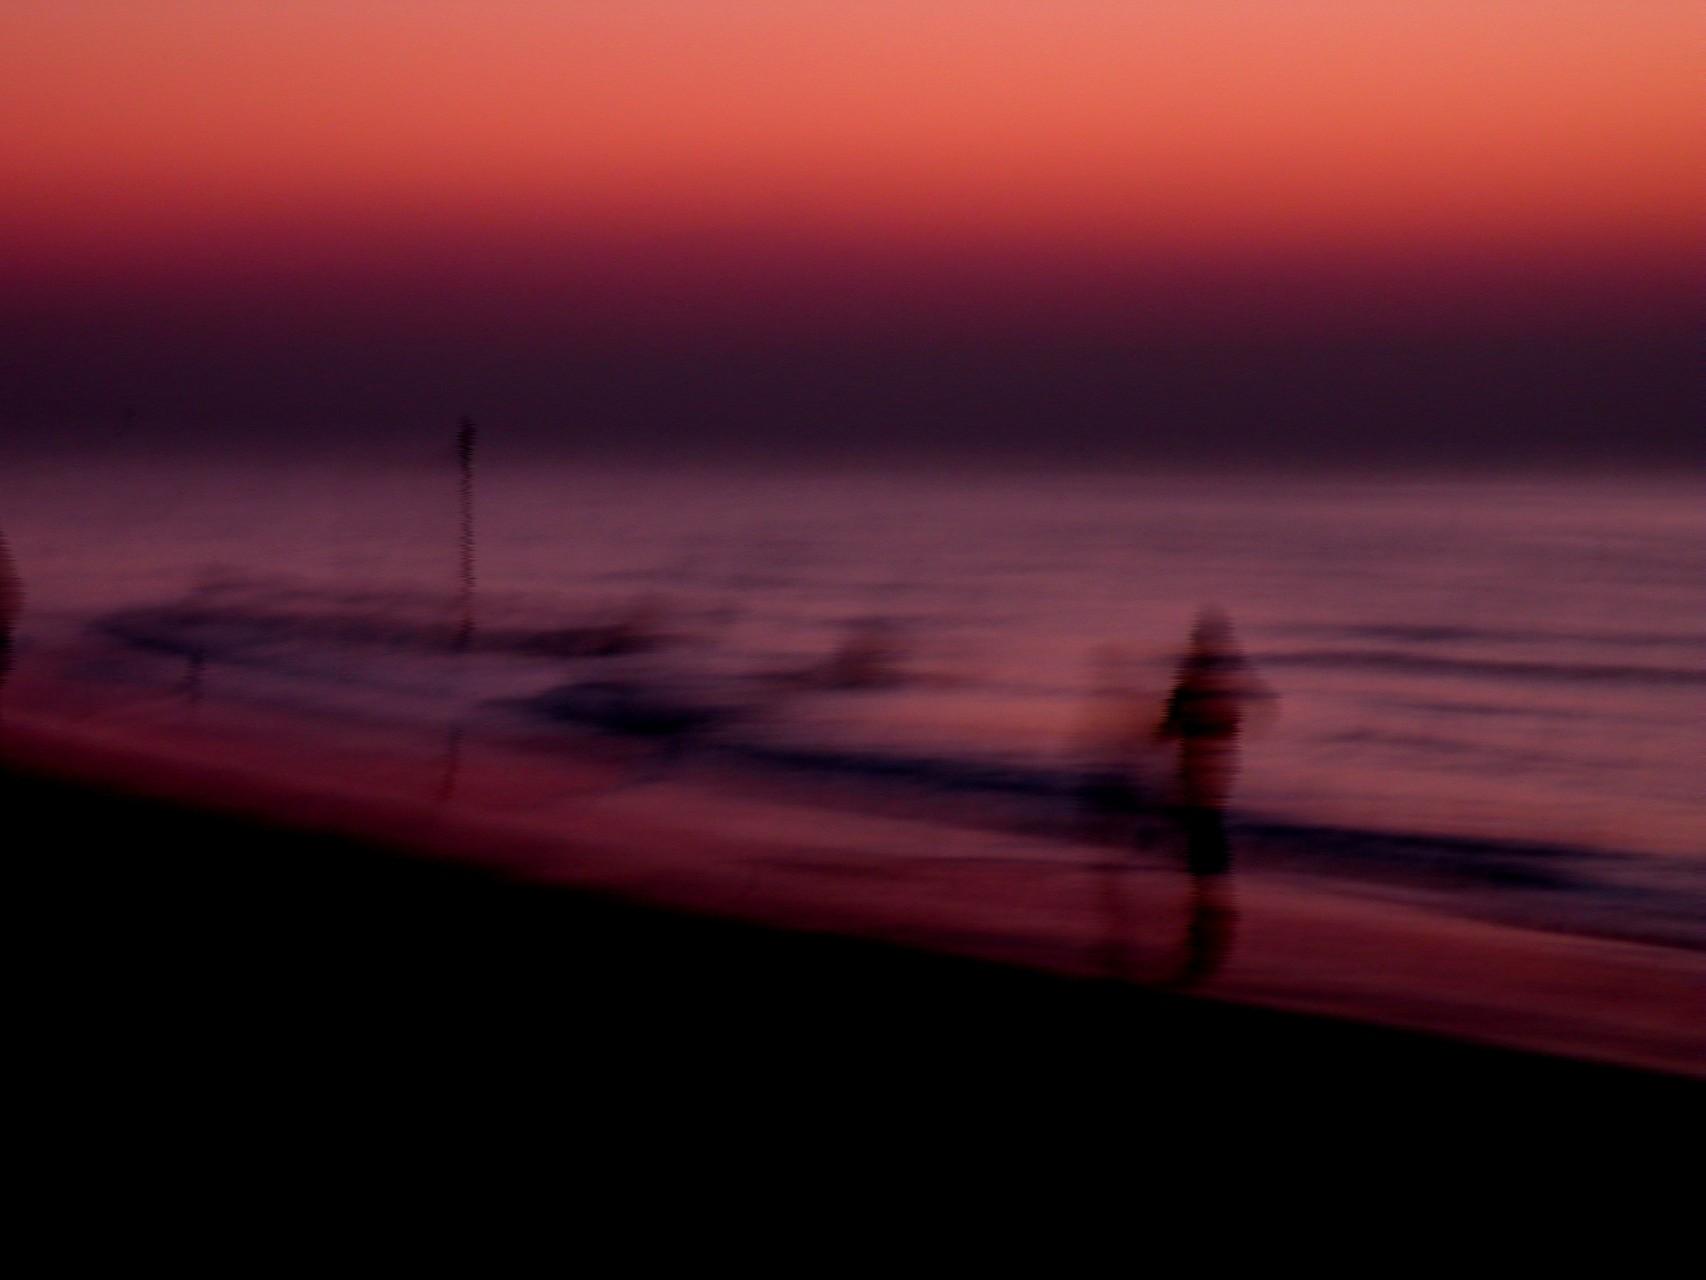 entlang am Meer 1, 2015